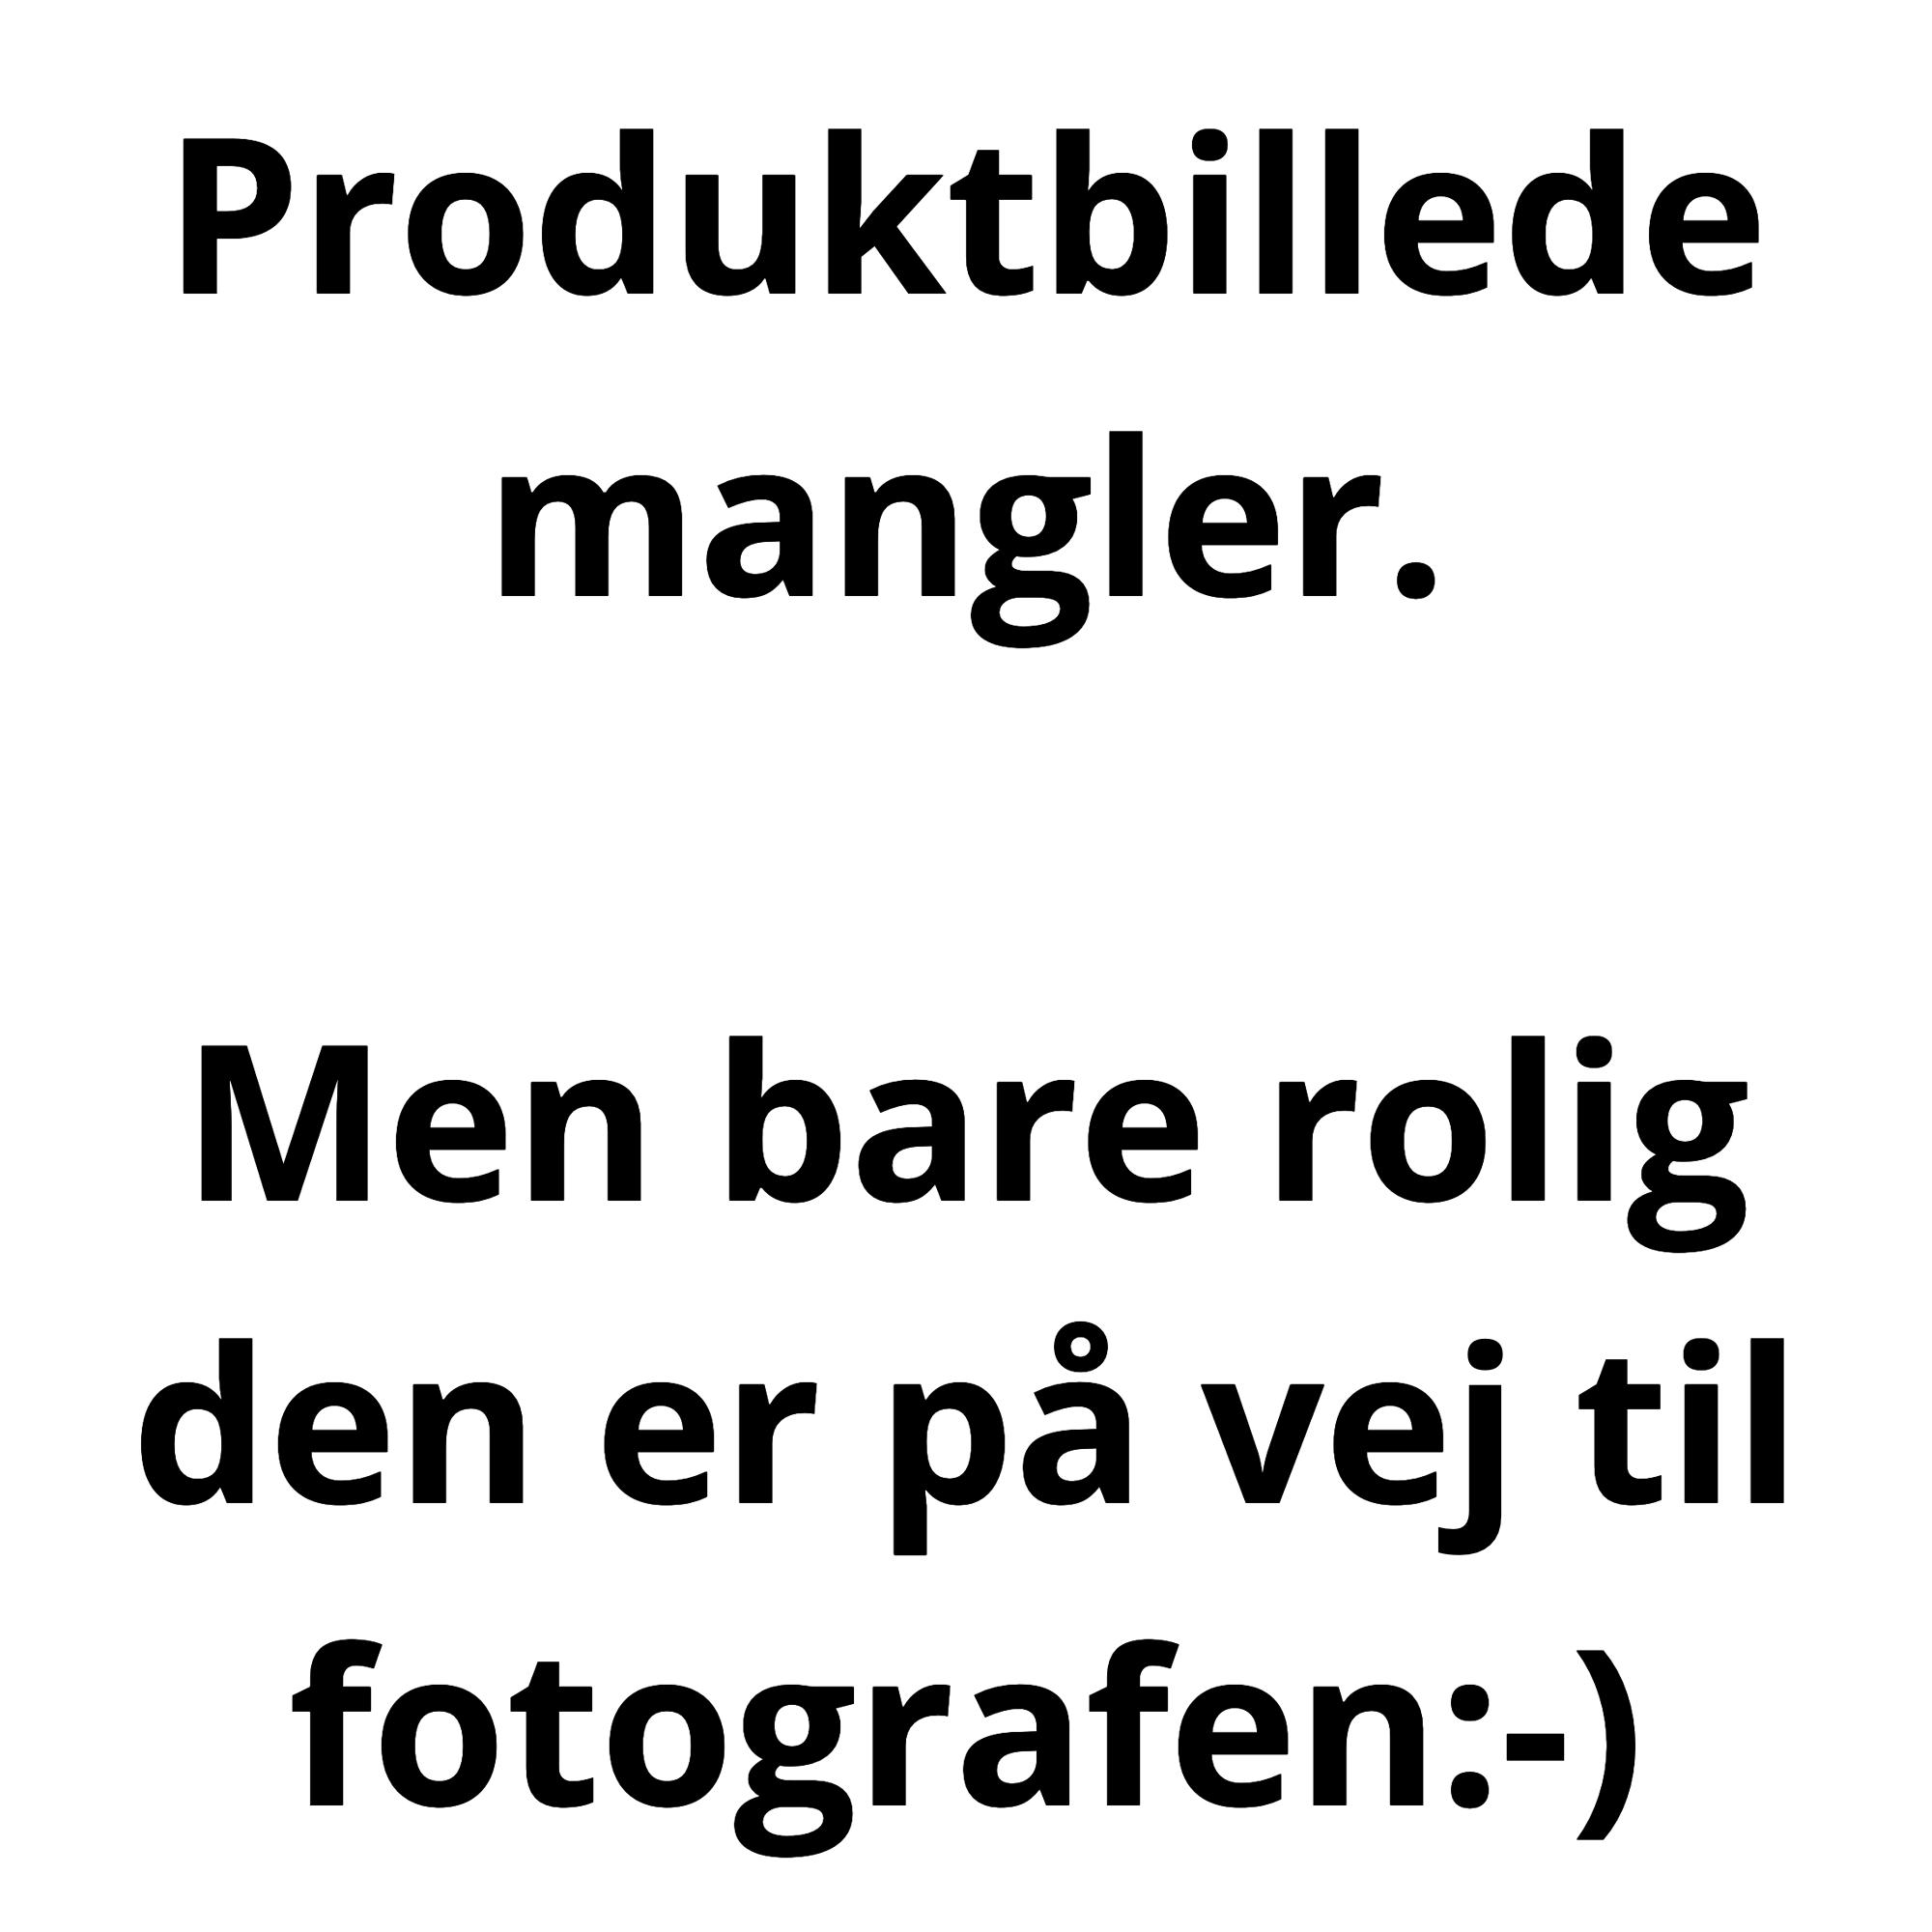 Brodit Passiv mobilholder til Apple iPhone 11 Pro Max/Xs Max m. Beskyttelsescover B:80-94 D:2-10- 711083